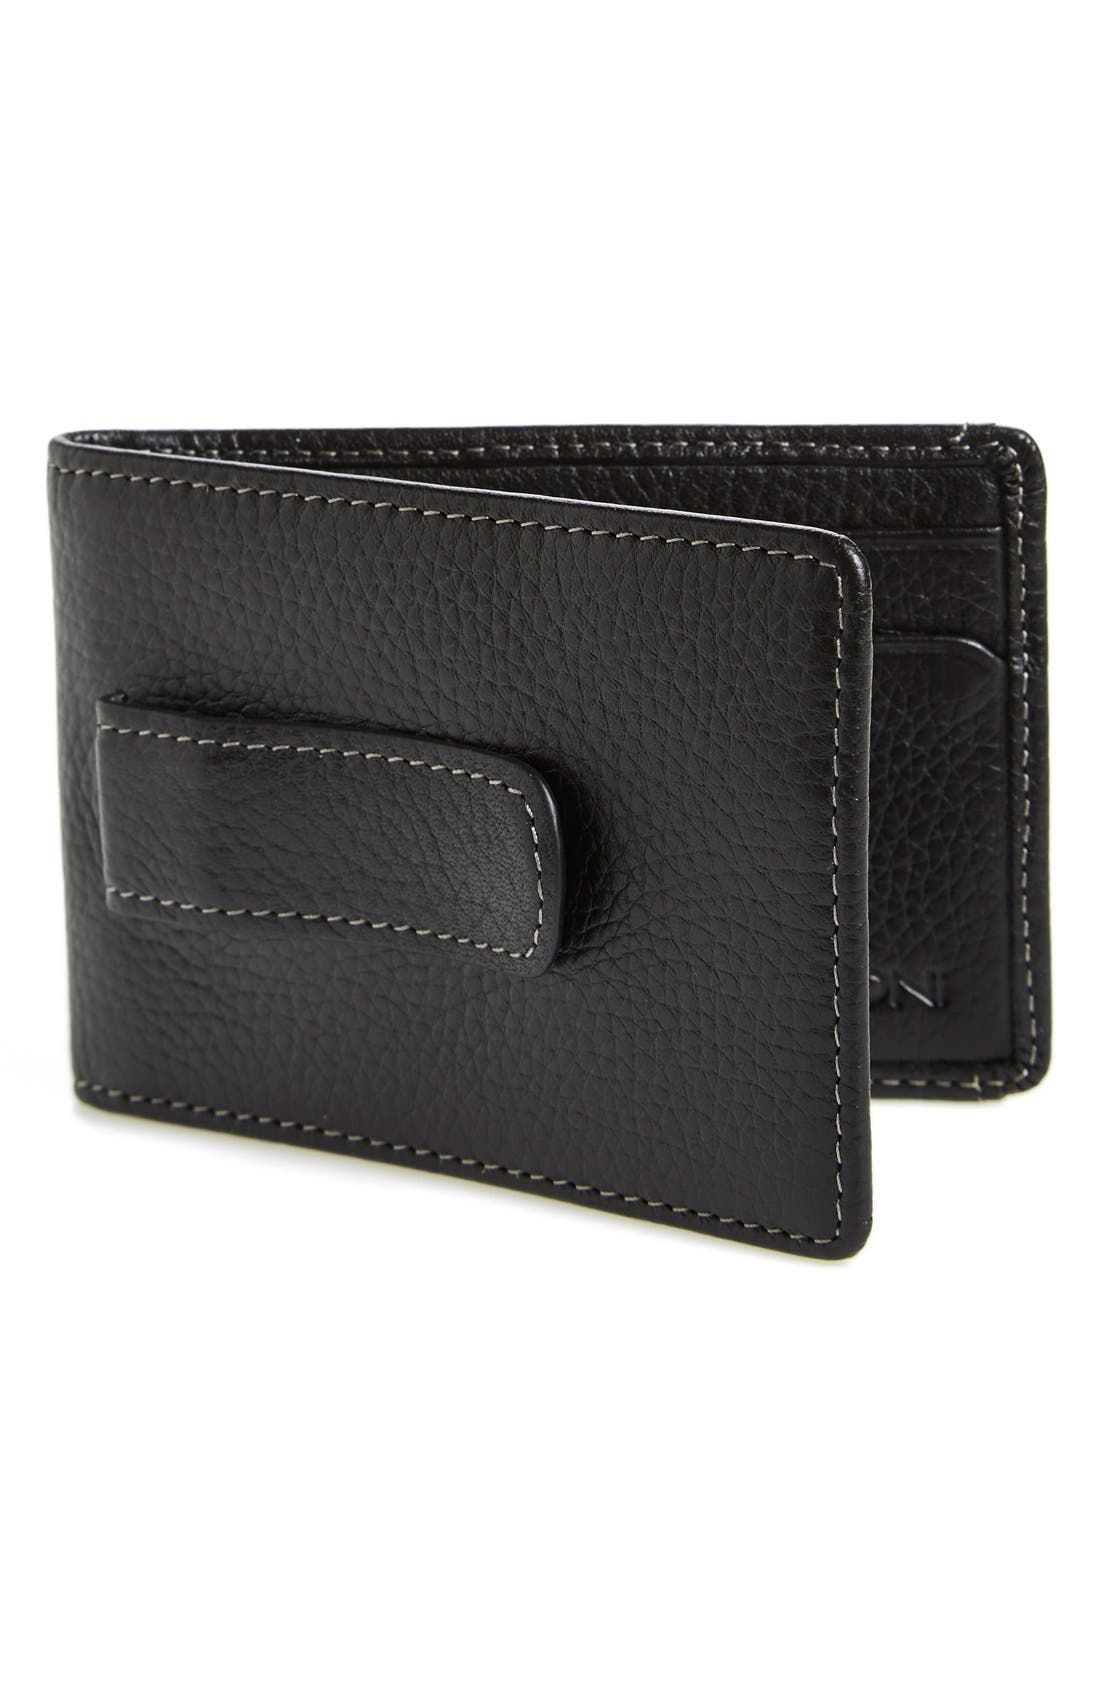 'Tyler' Money Clip Wallet,                             Main thumbnail 1, color,                             001